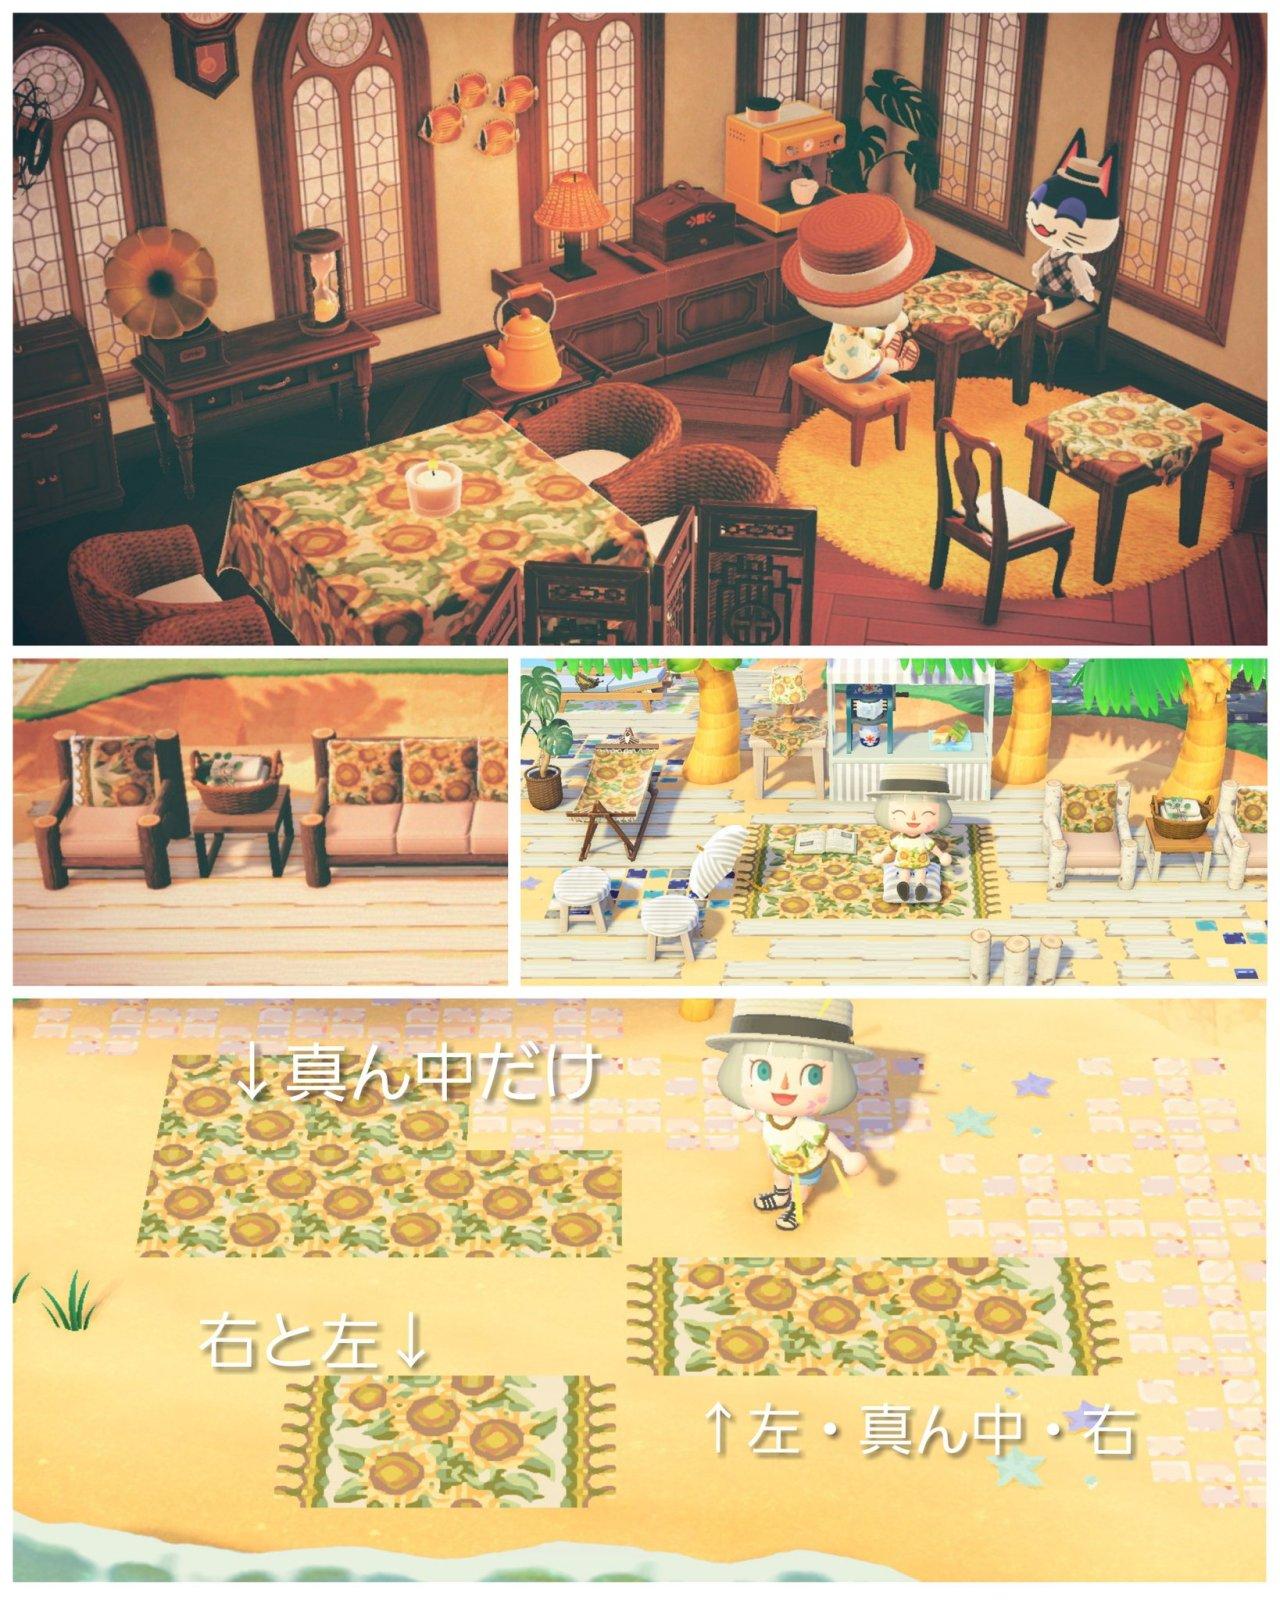 qr-closet:sunflower rug & clothing 🌻 creator...